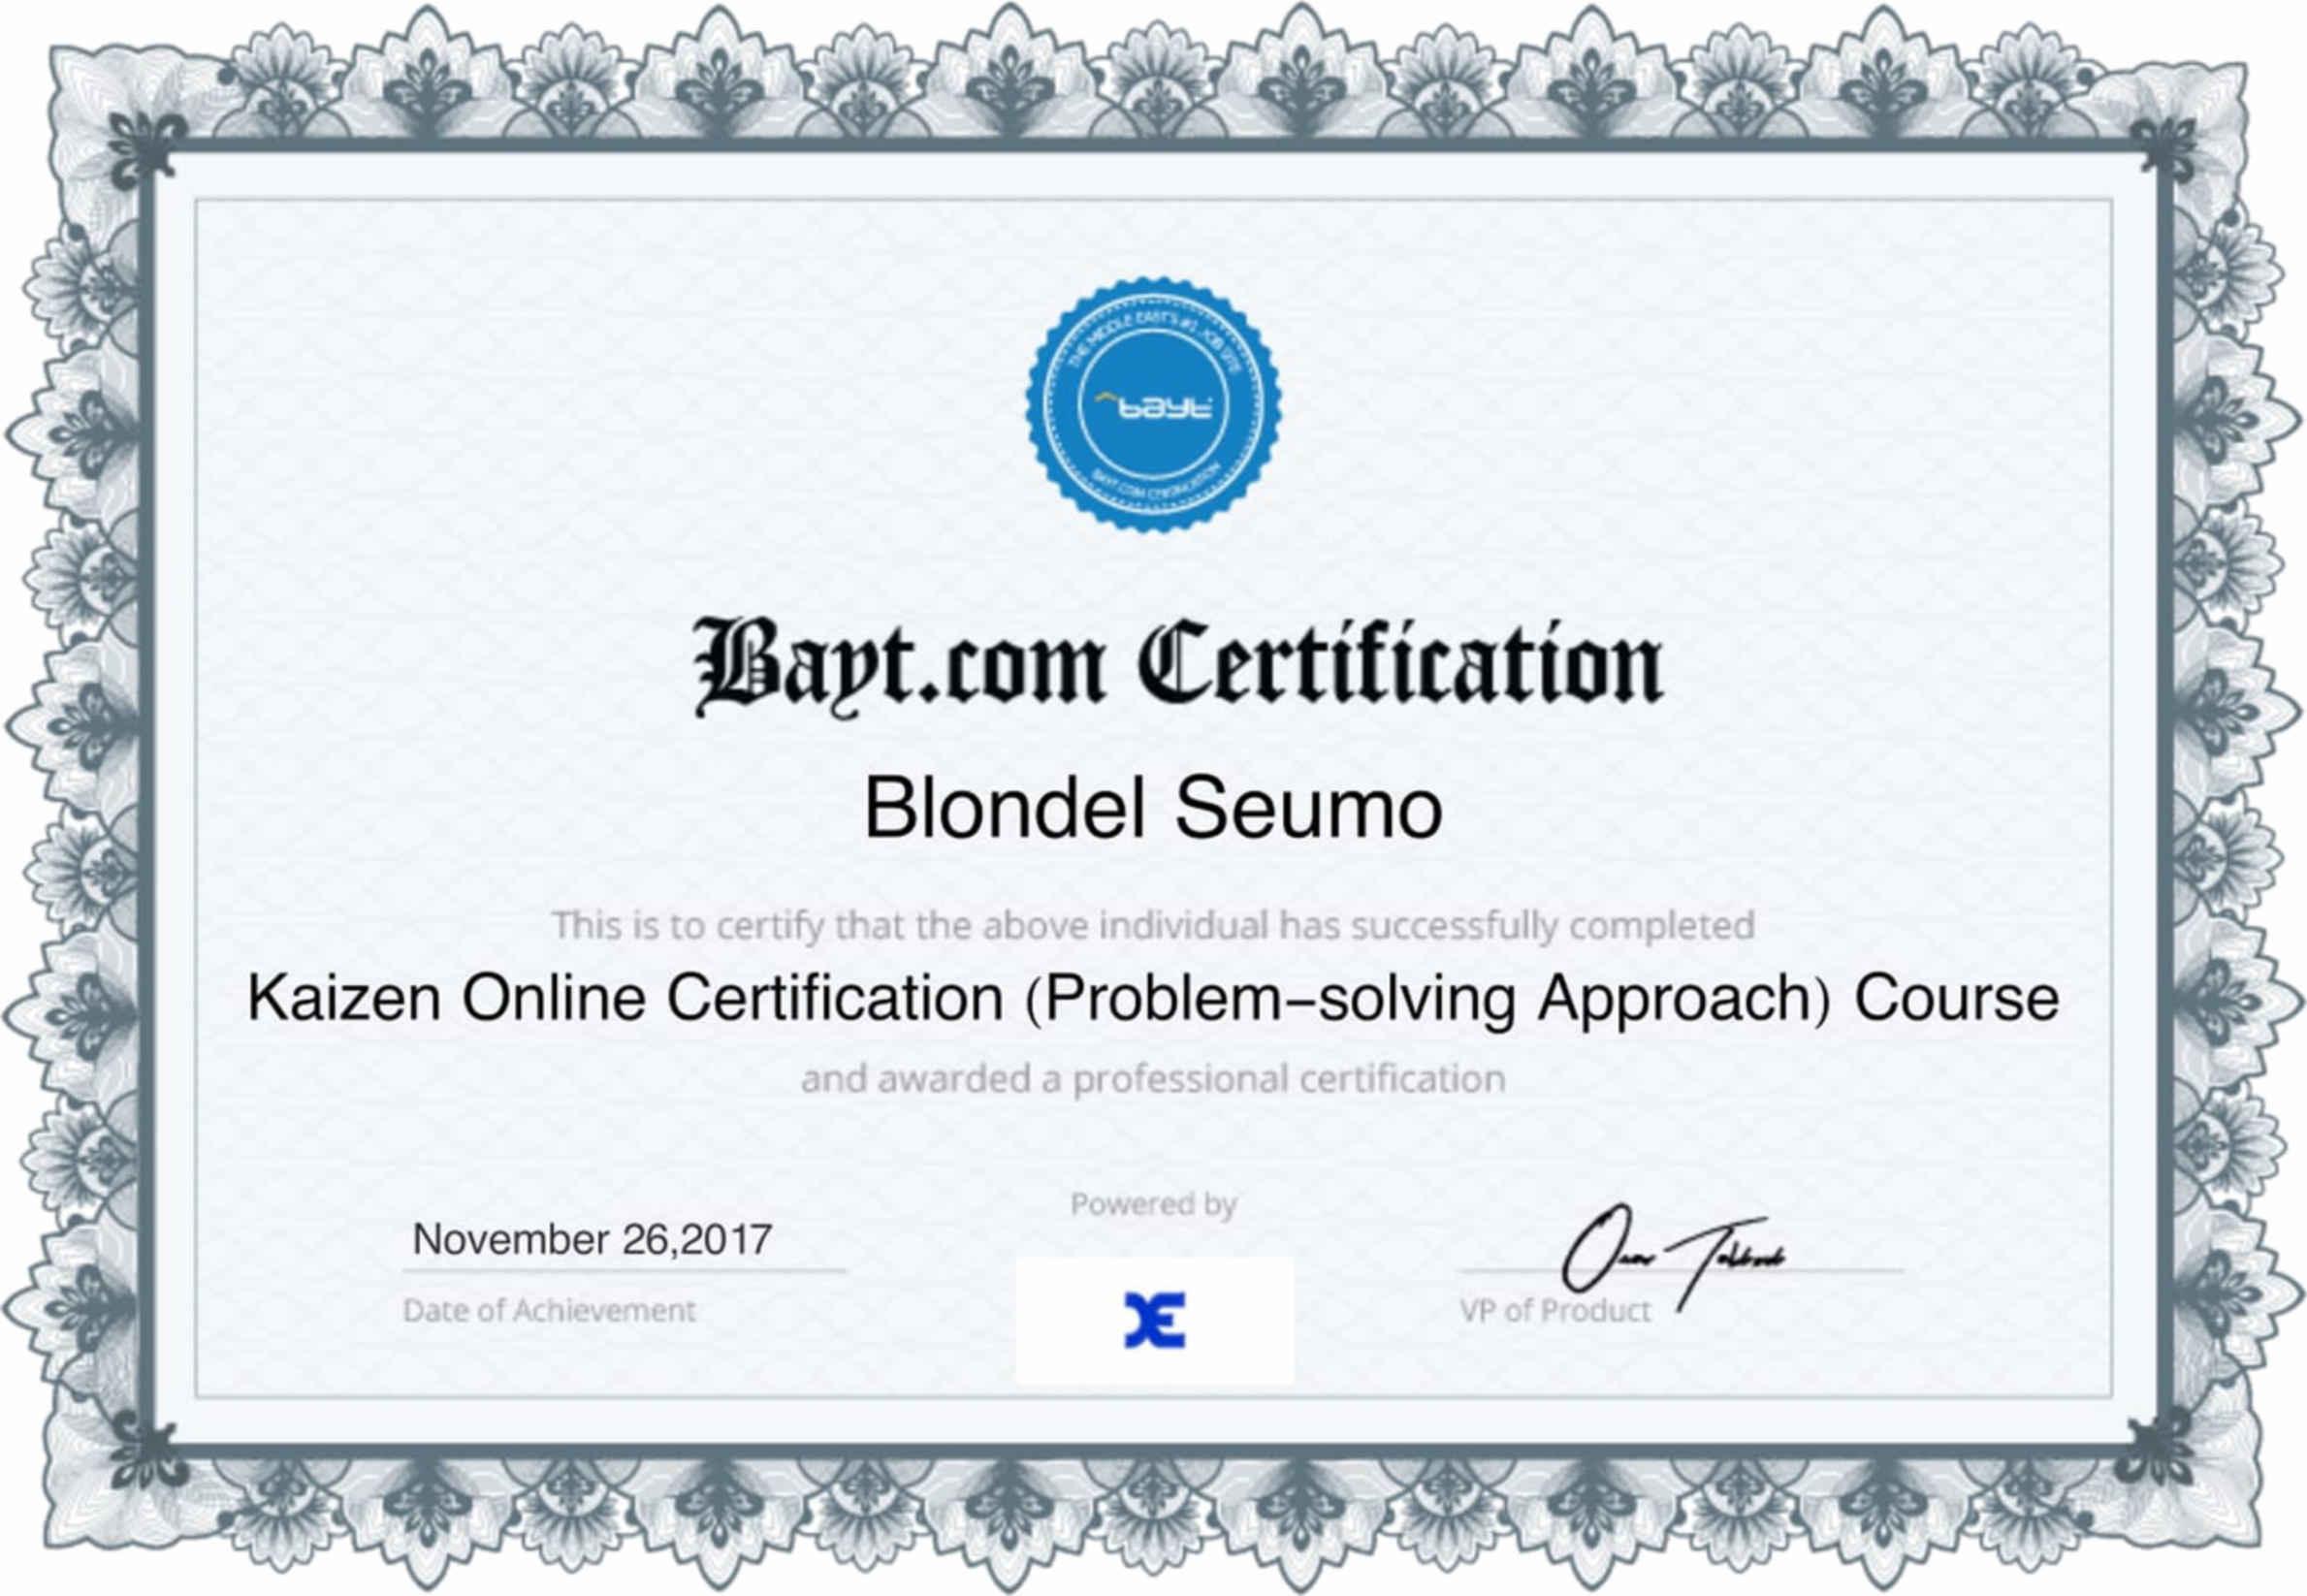 Blondel SEUMO - Bayt.com